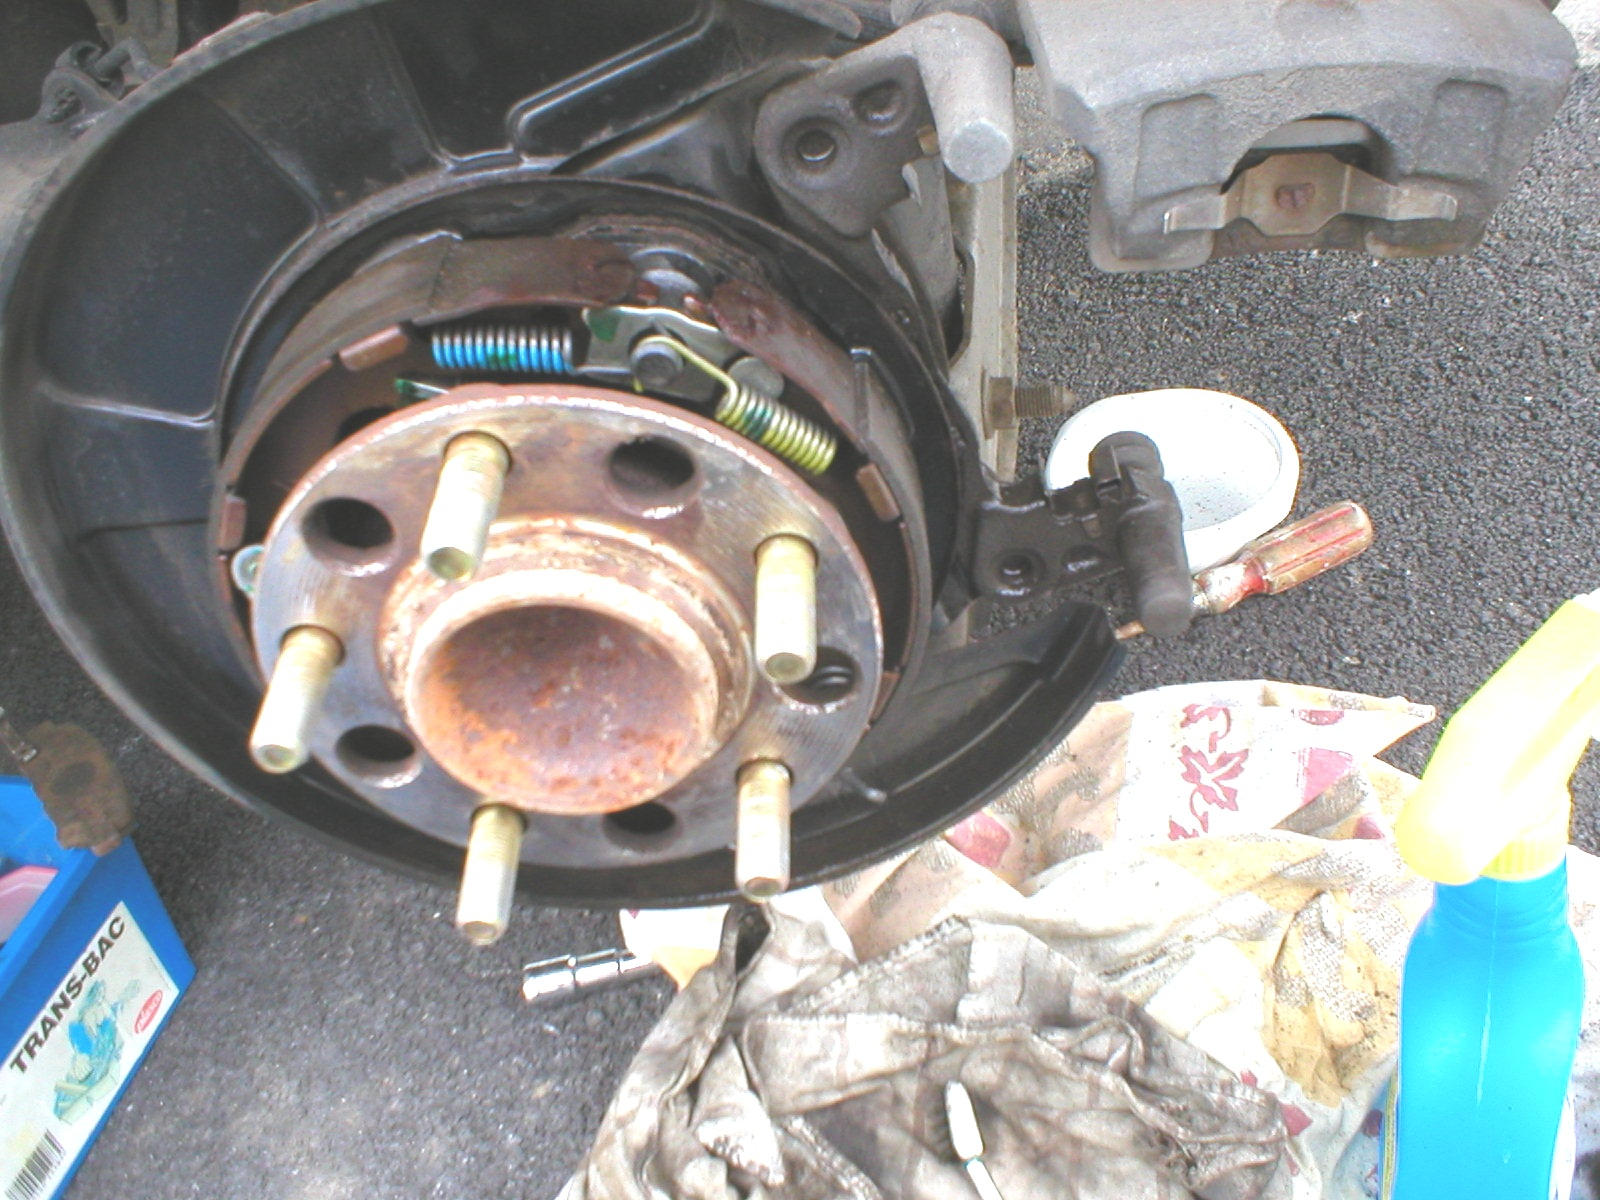 entretien caliber essence - Page 3 446682tambour2